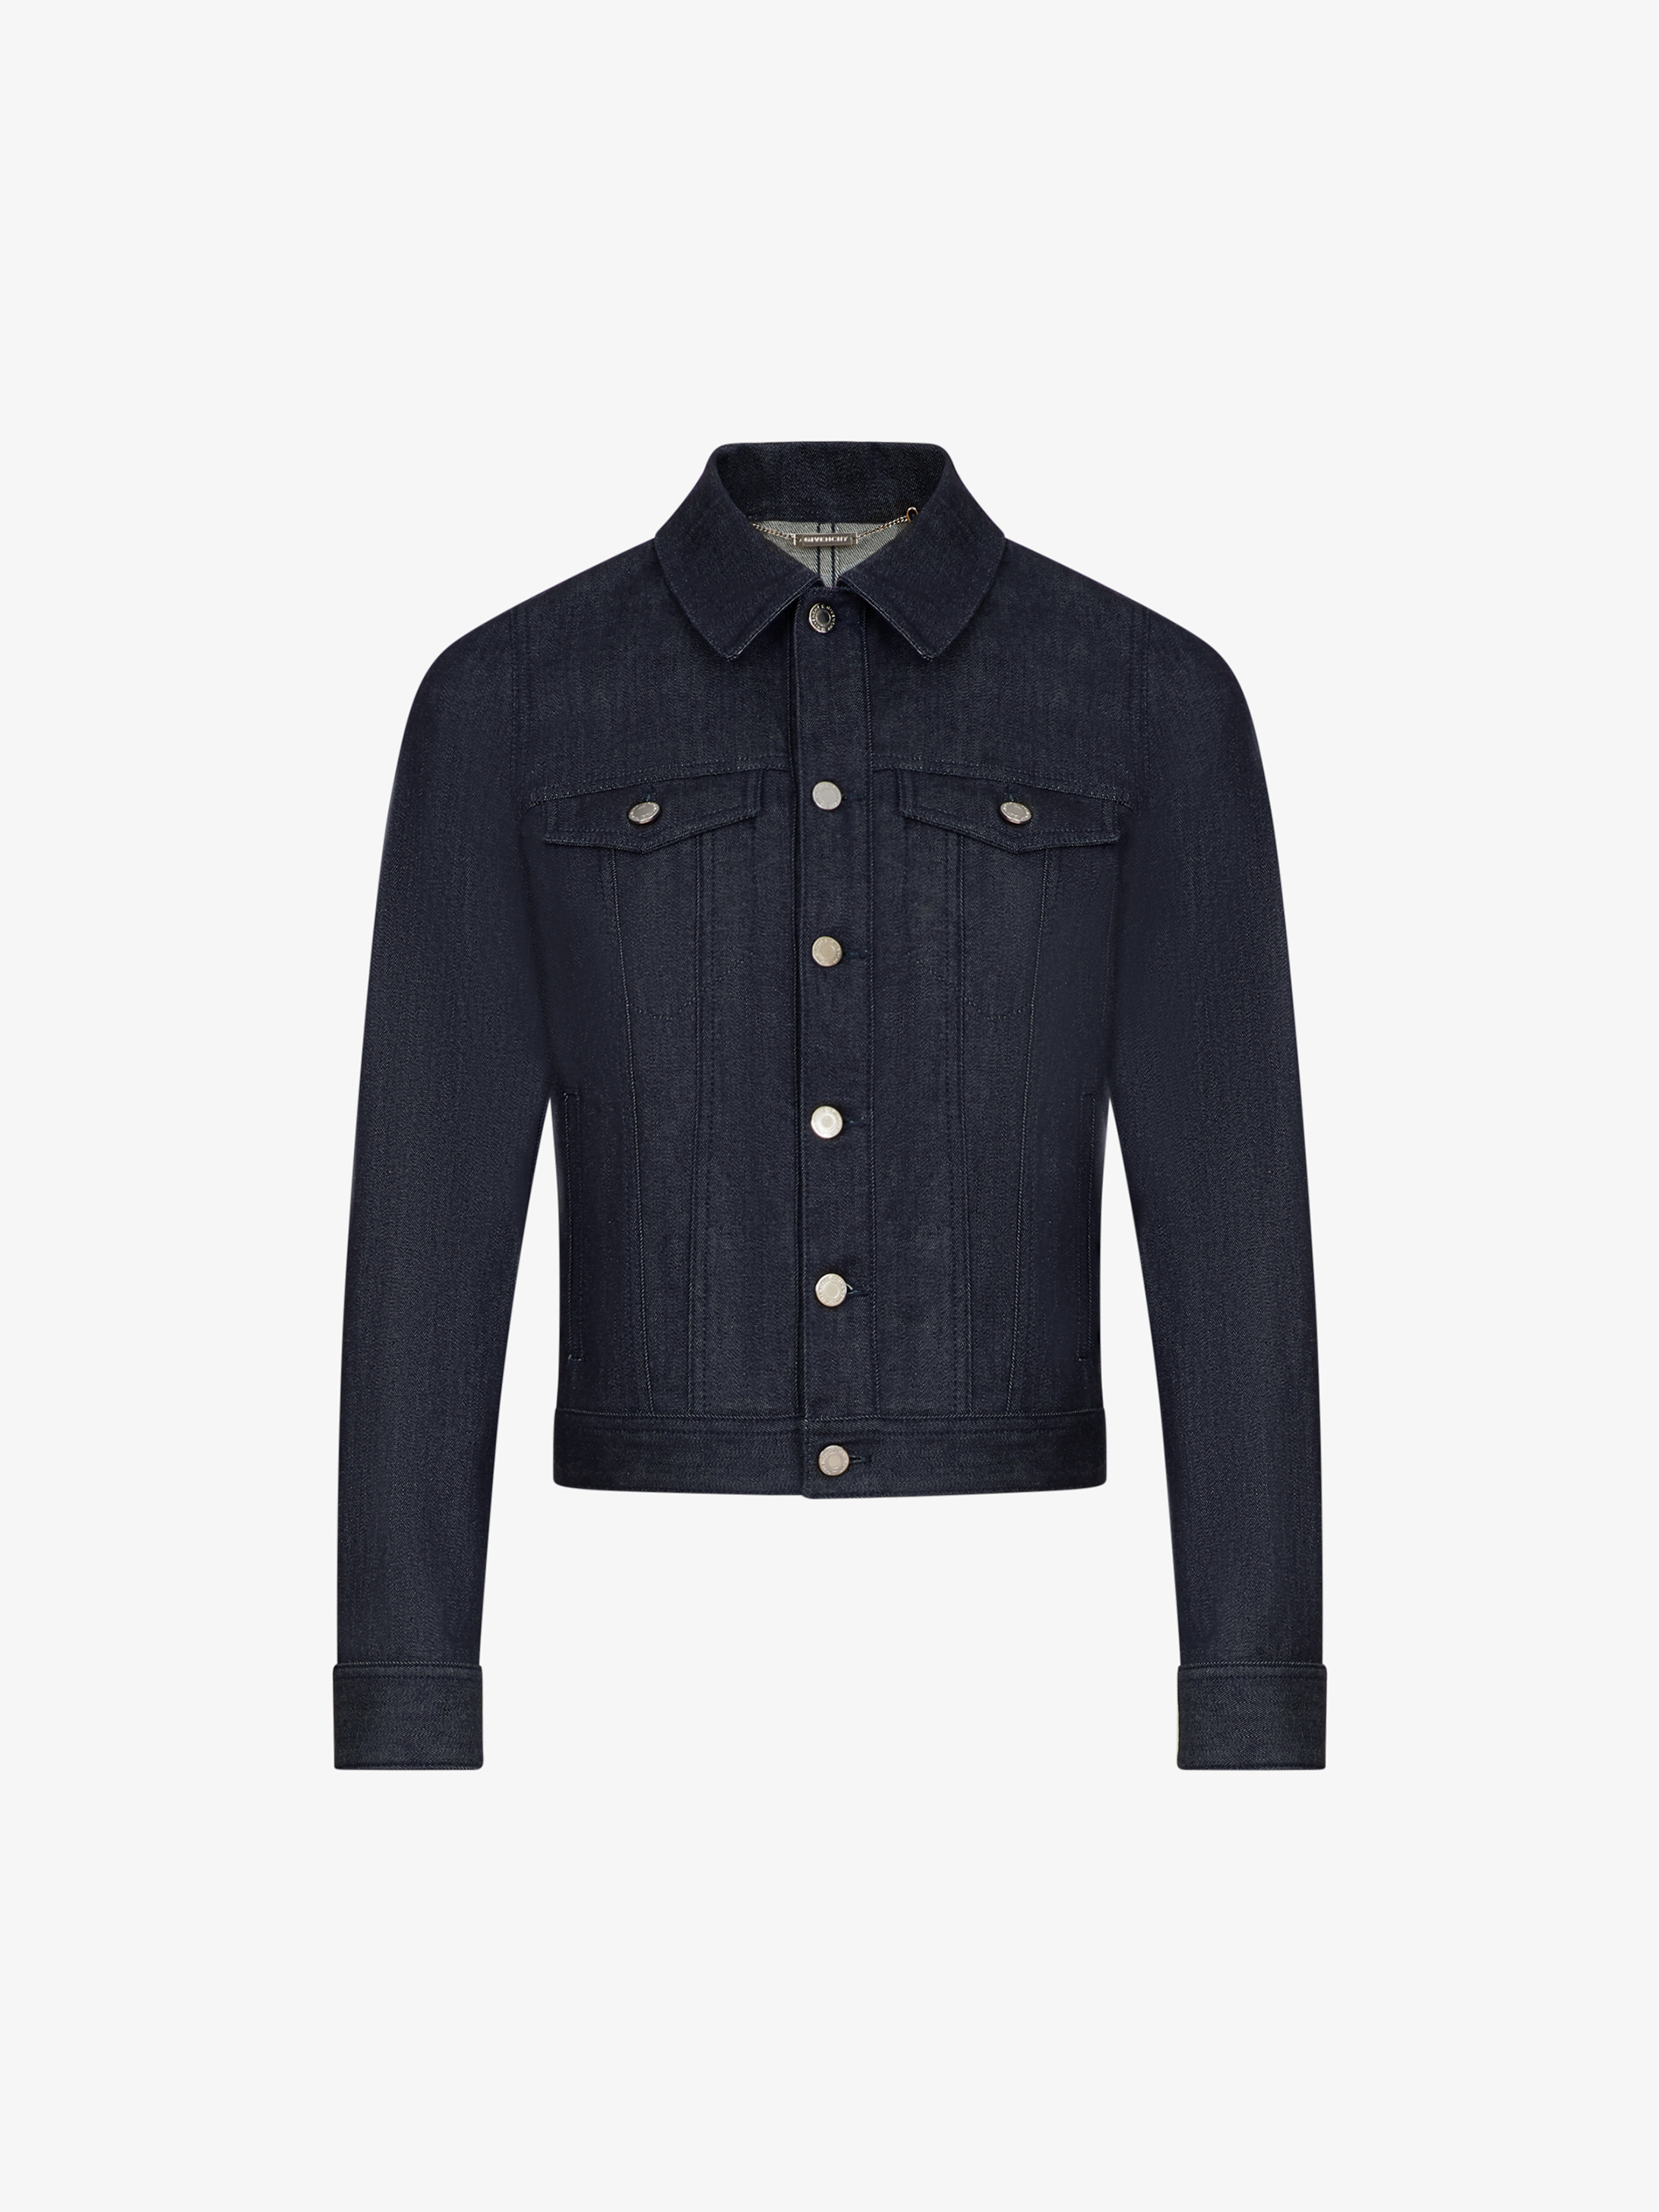 GIVENCHY PARIS denim jacket